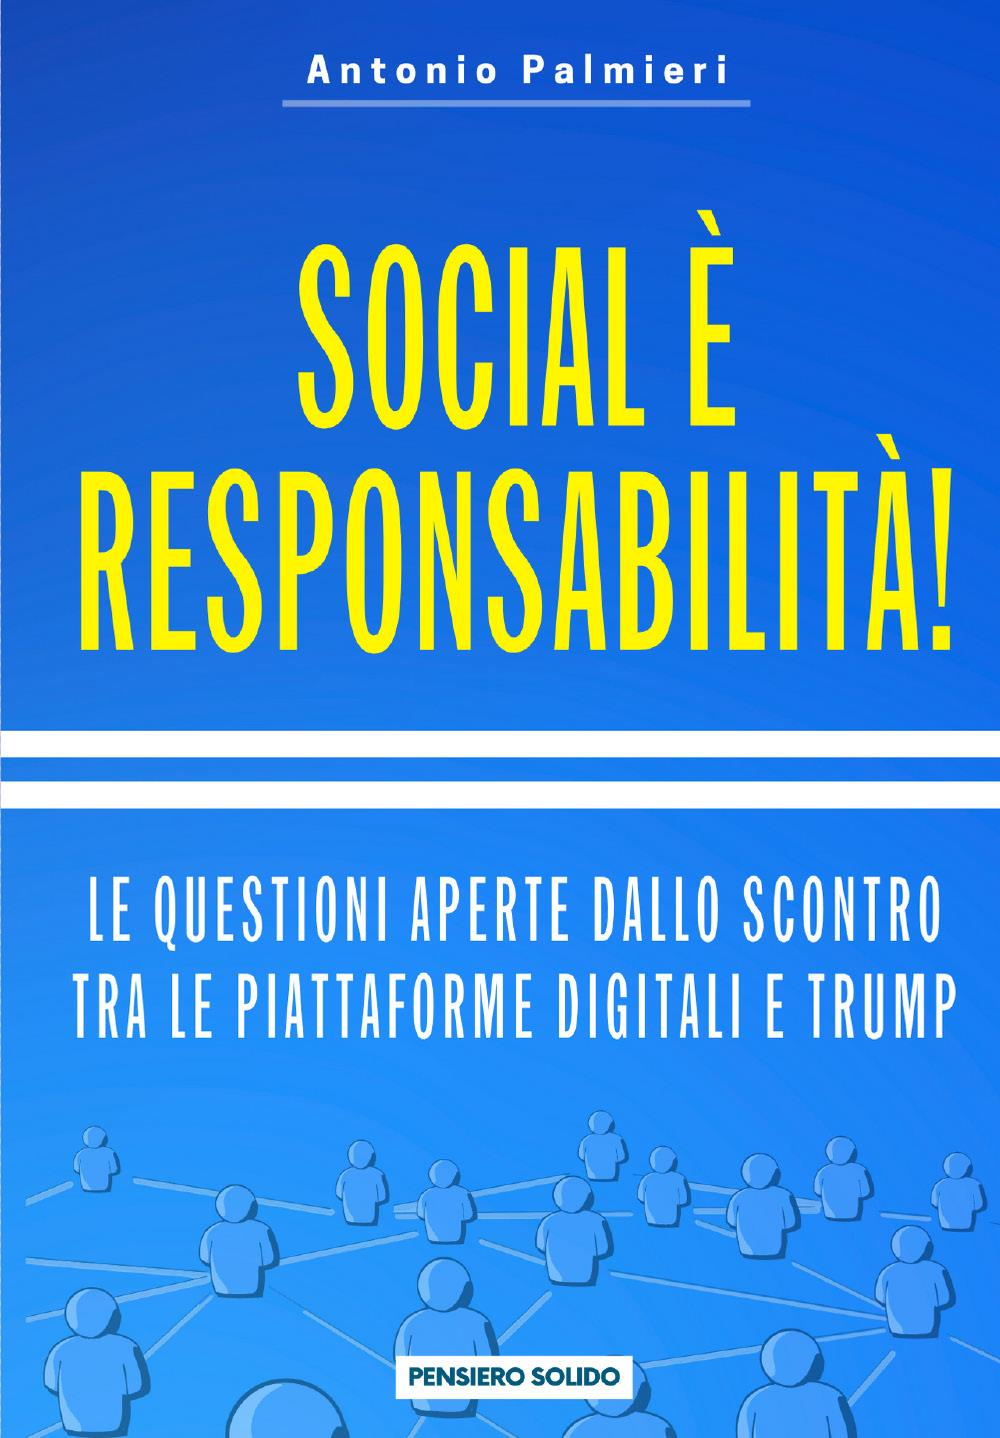 Social è responsabilità!